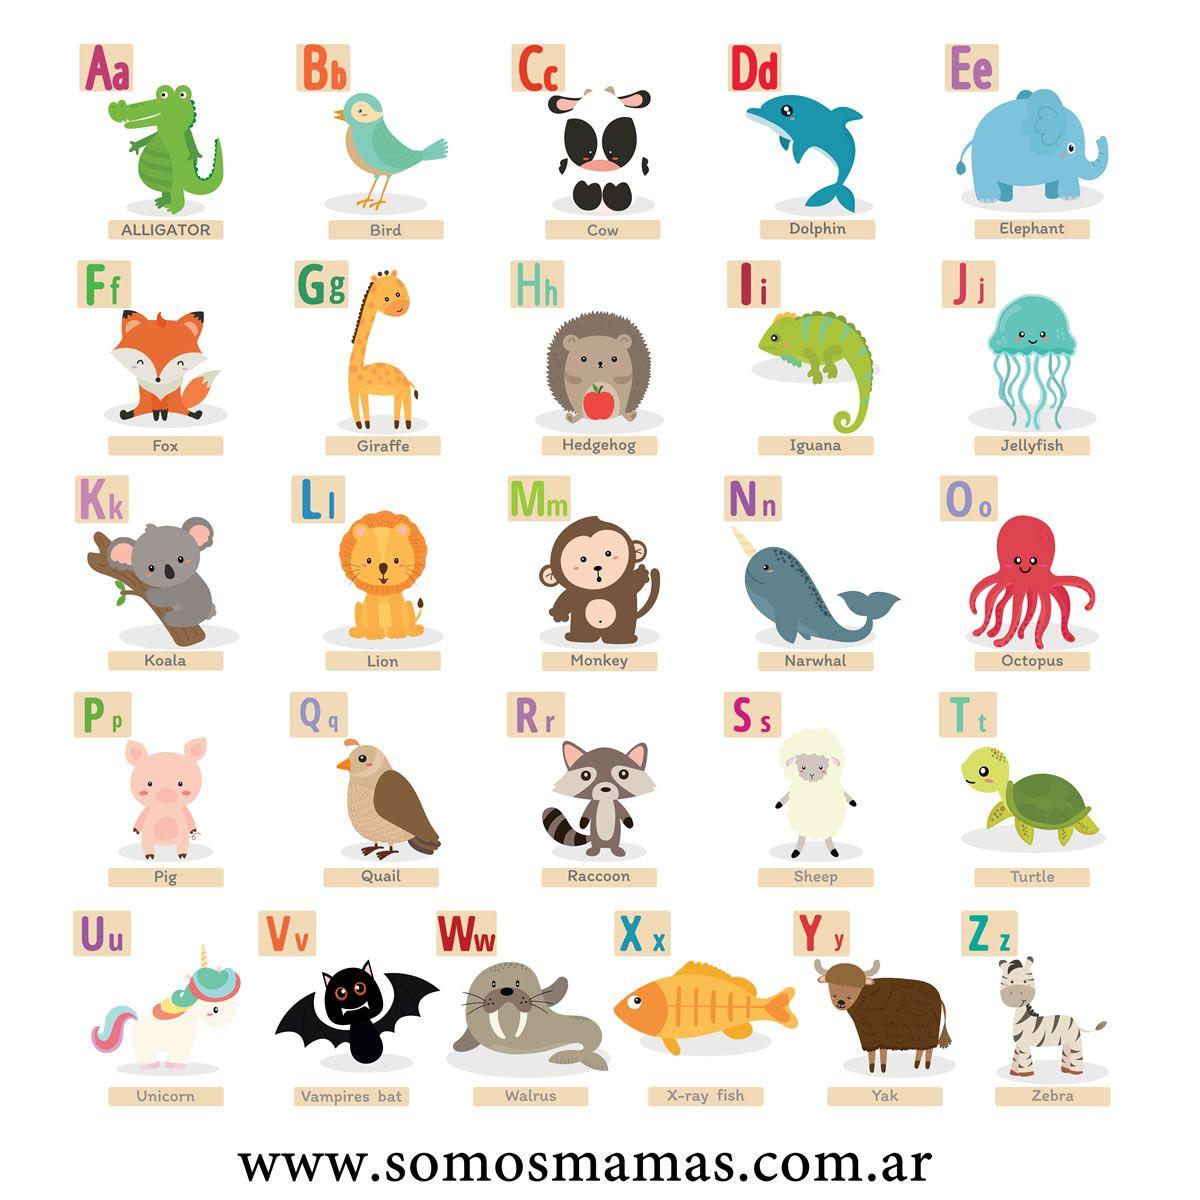 Animales En Ingles Lista De 150 Animales En Ingles Y Espanol Nombres De Animales Animales En Ingles Loteria De Animales